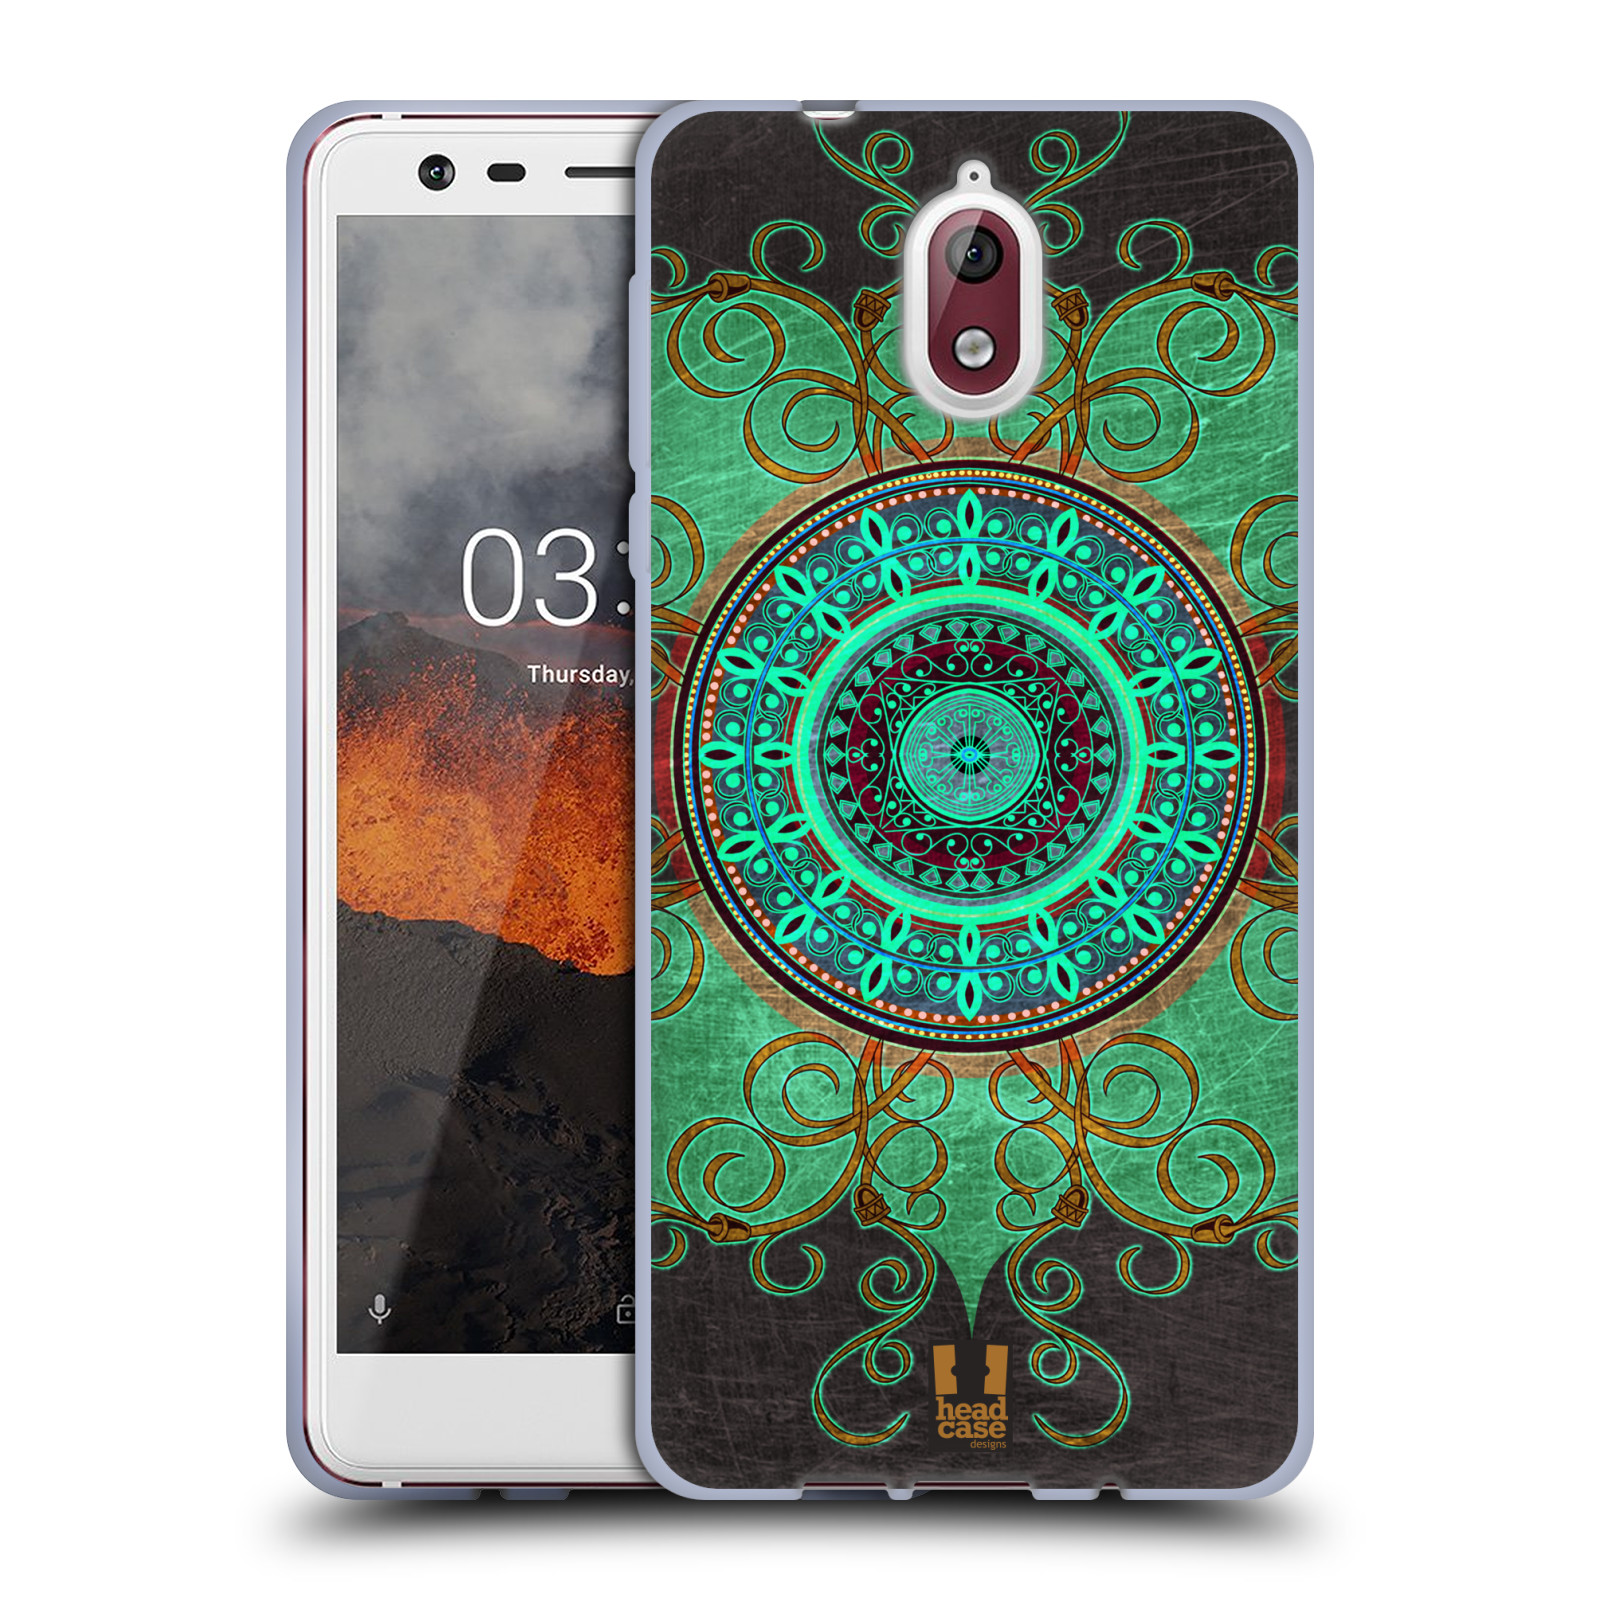 Silikonové pouzdro na mobil Nokia 3.1 - Head Case - ARAB MANDALA